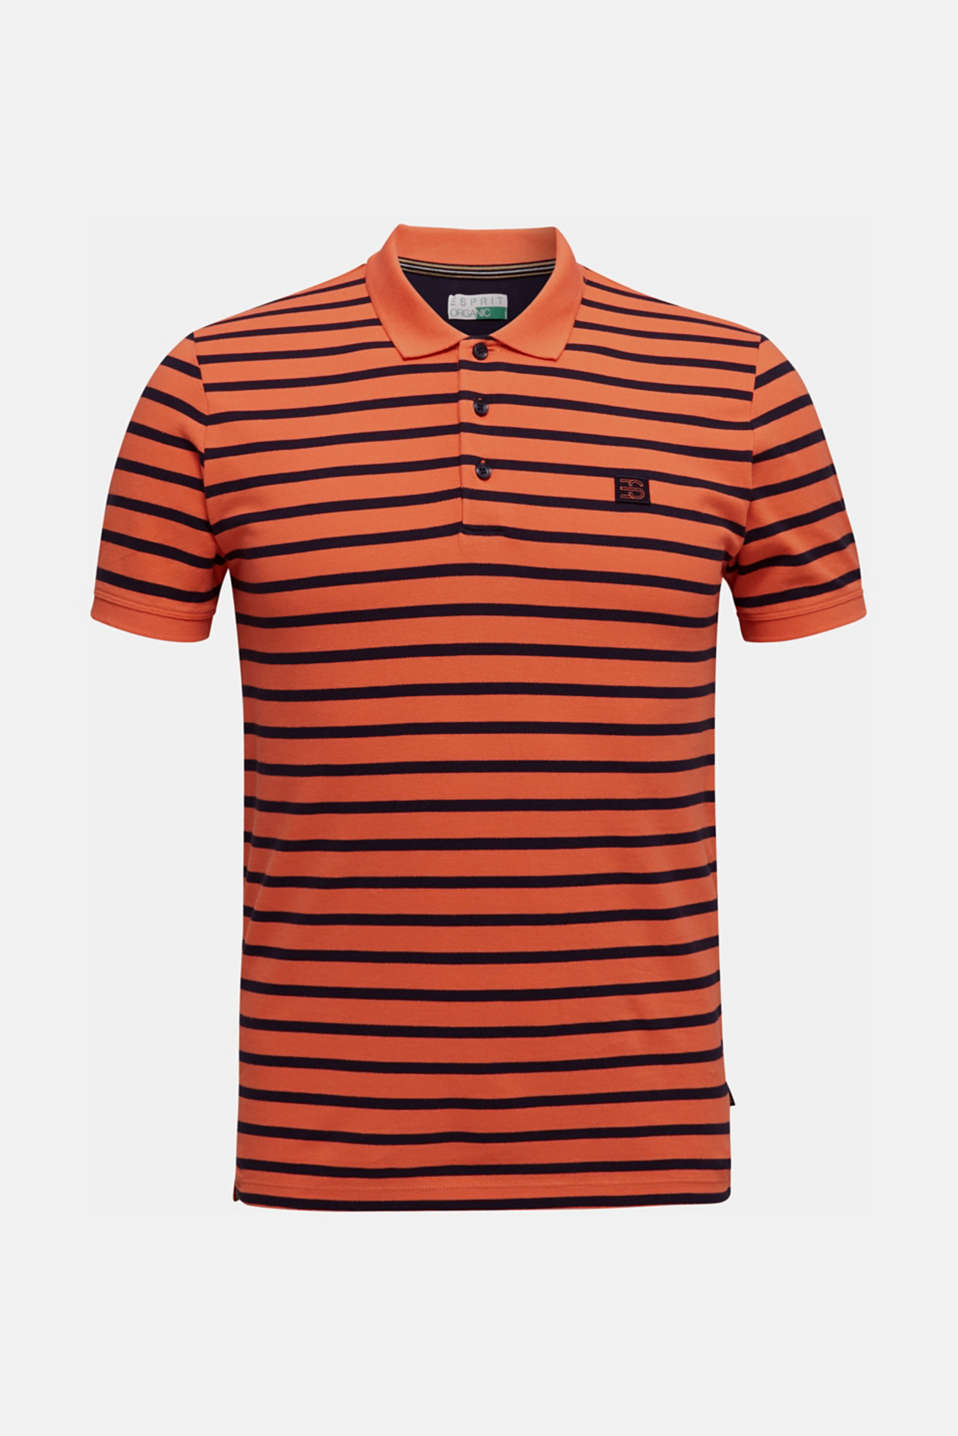 Piqué polo shirt in 100% cotton, RUST ORANGE 3, detail image number 6